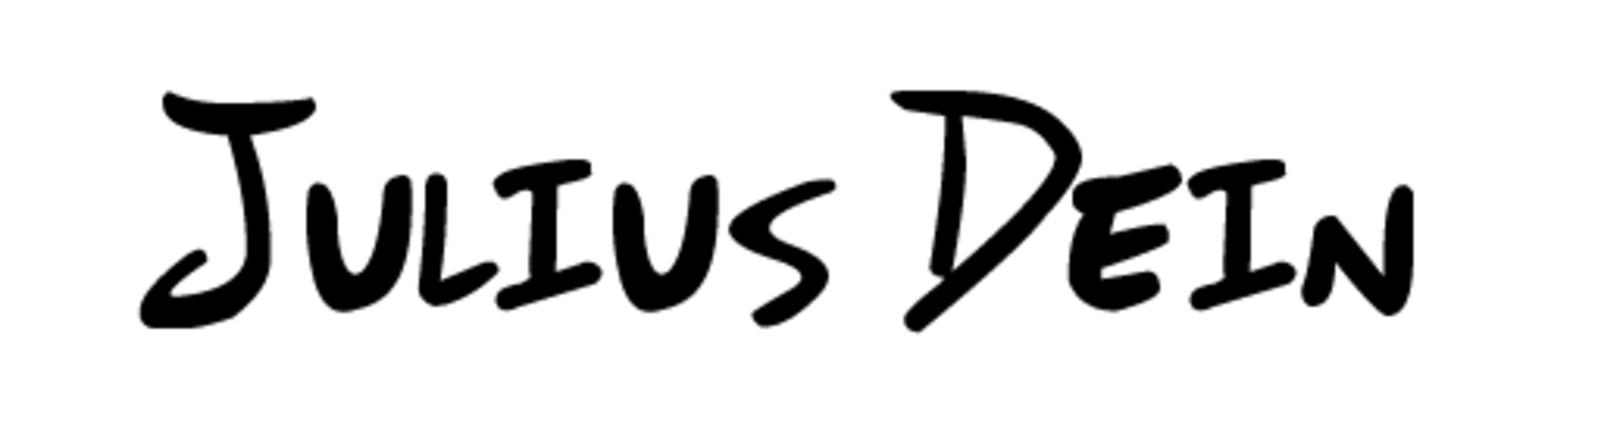 JULIUS DEIN : EUROPEAN MAGIC TOUR